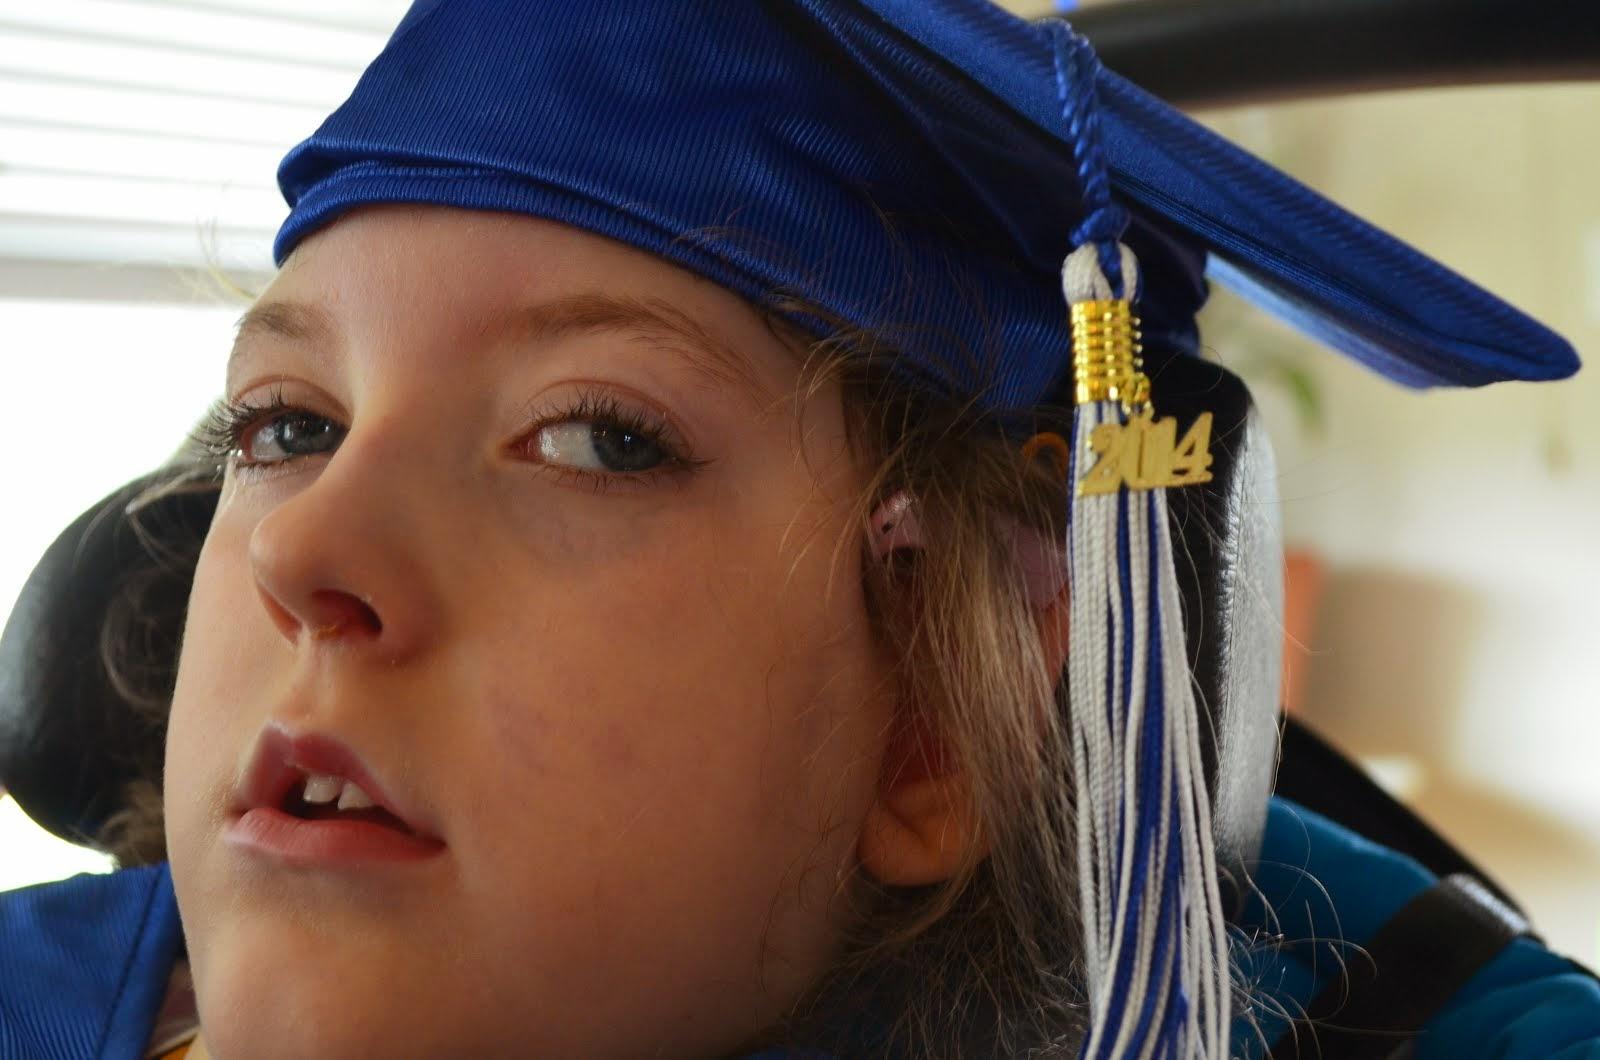 2014: Preschool Graduate